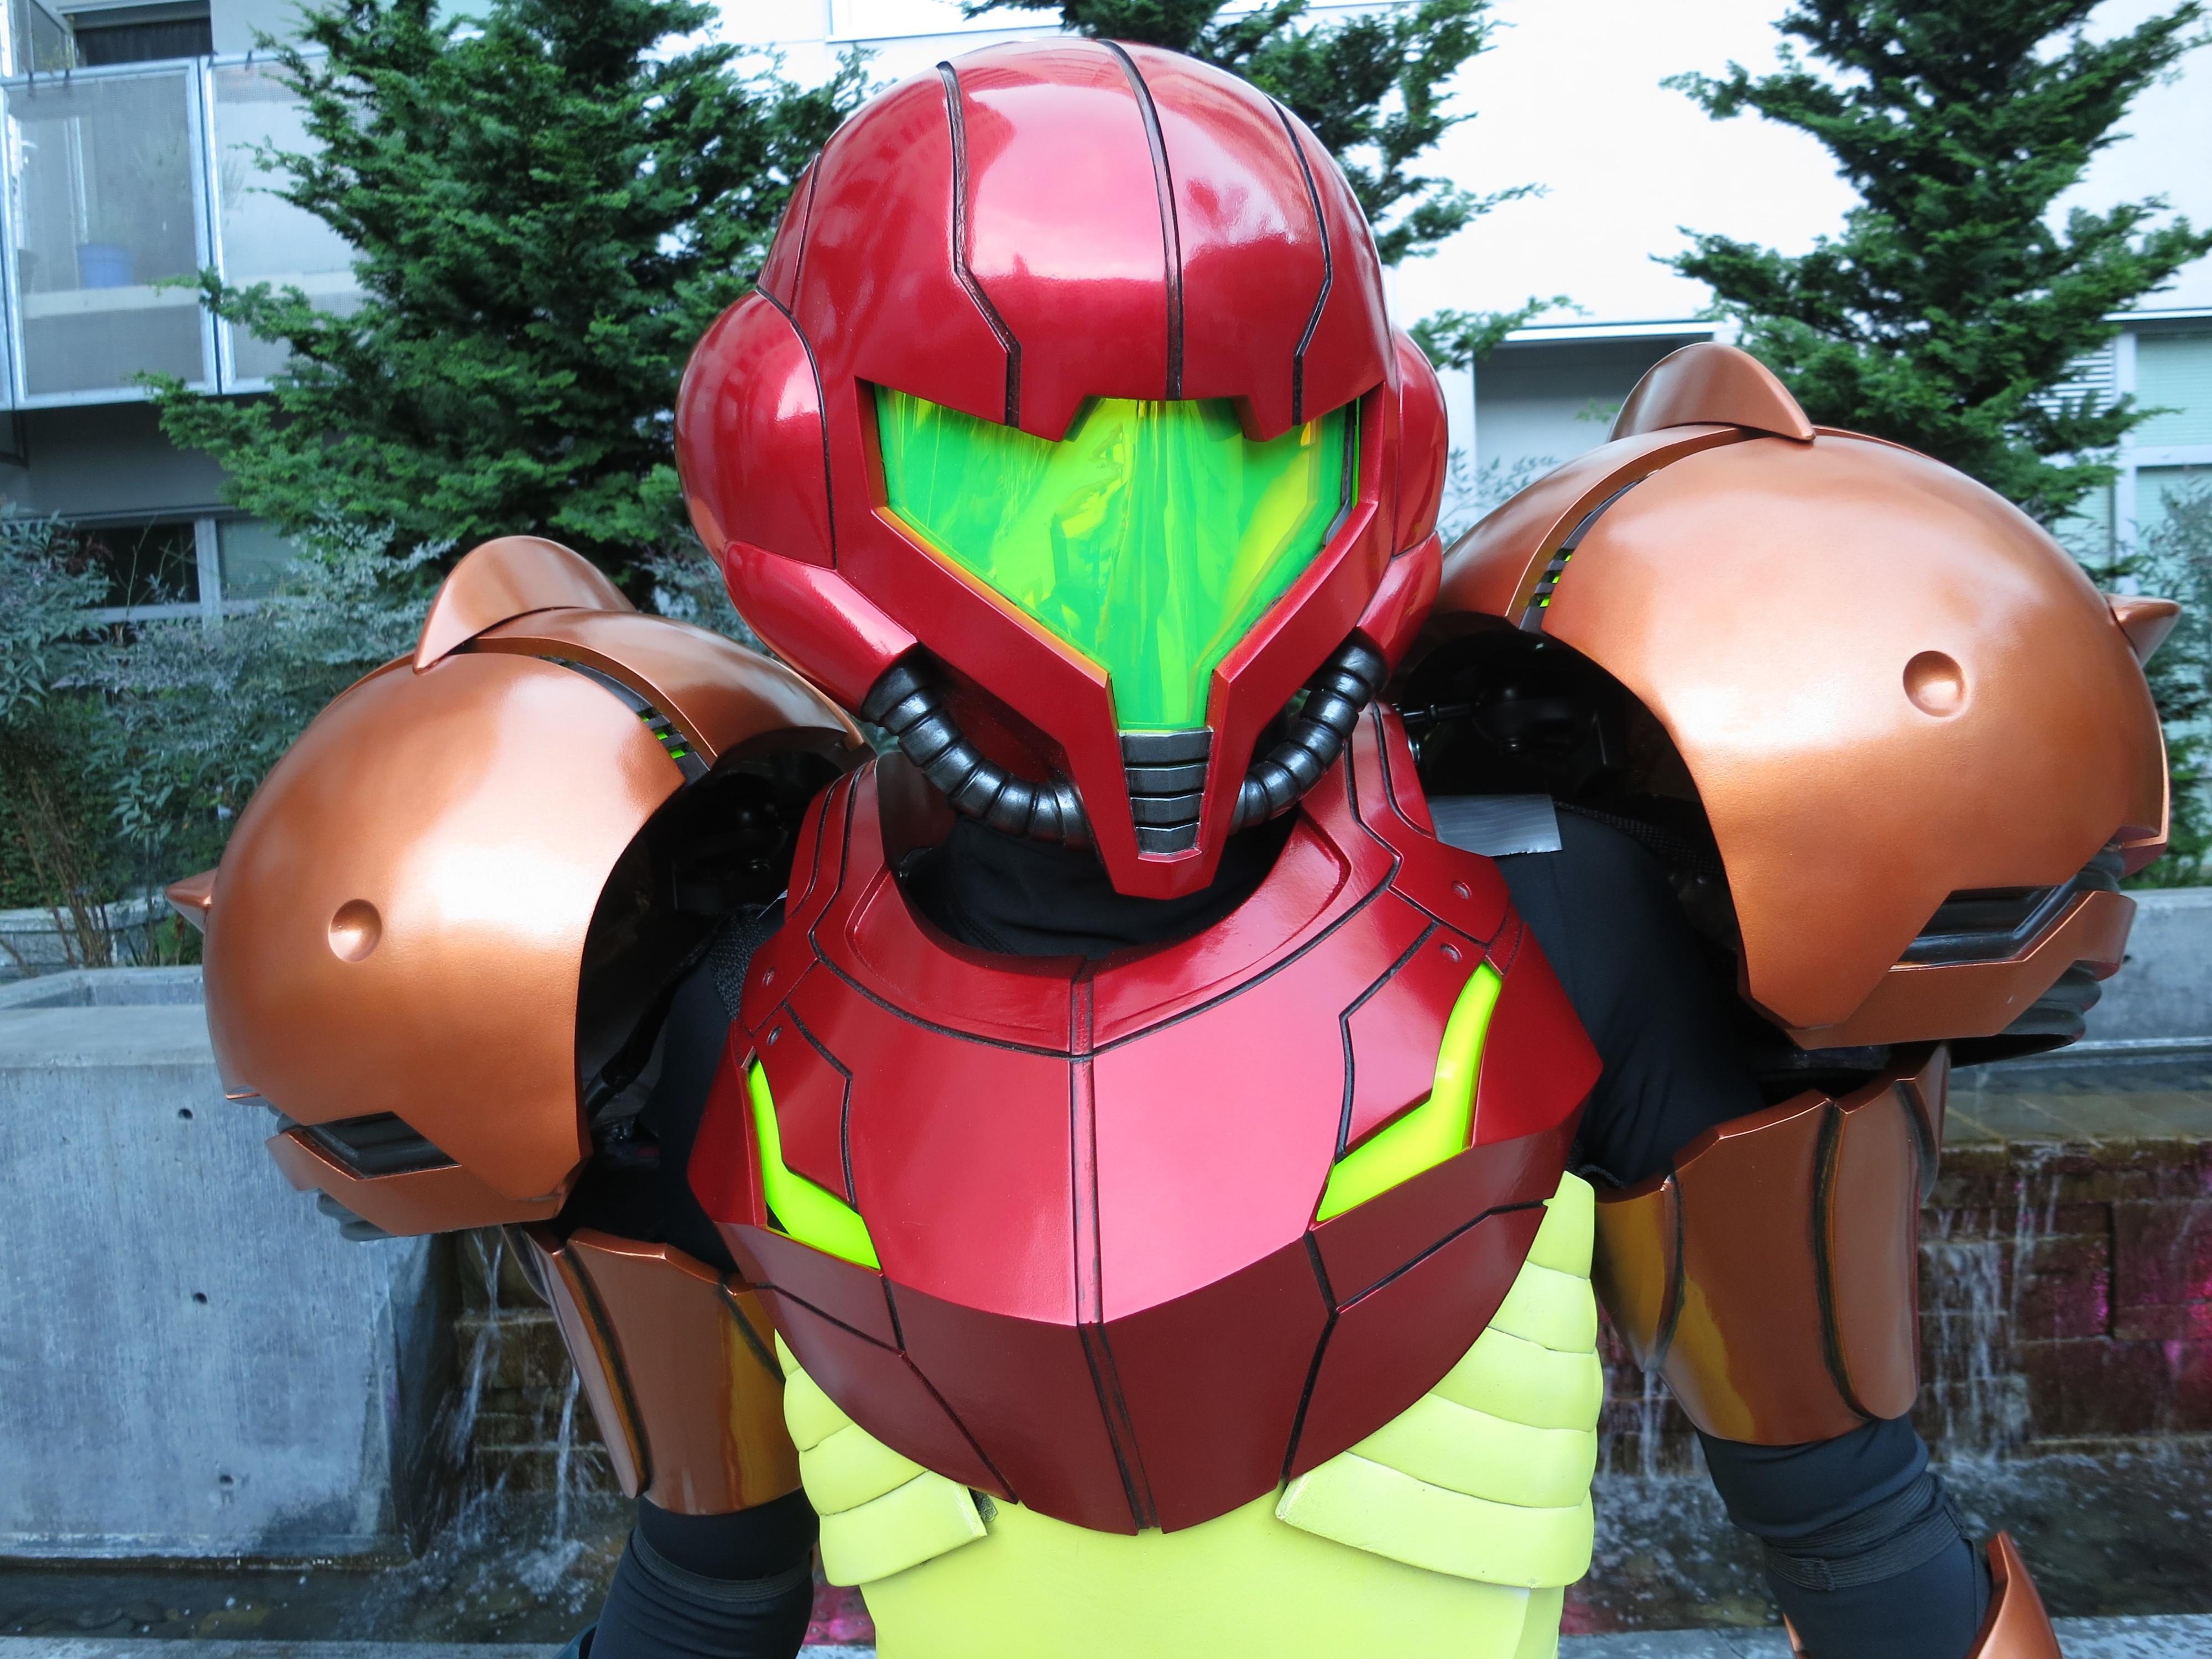 3d Printing A Samus Aran Costume From Metroid Make